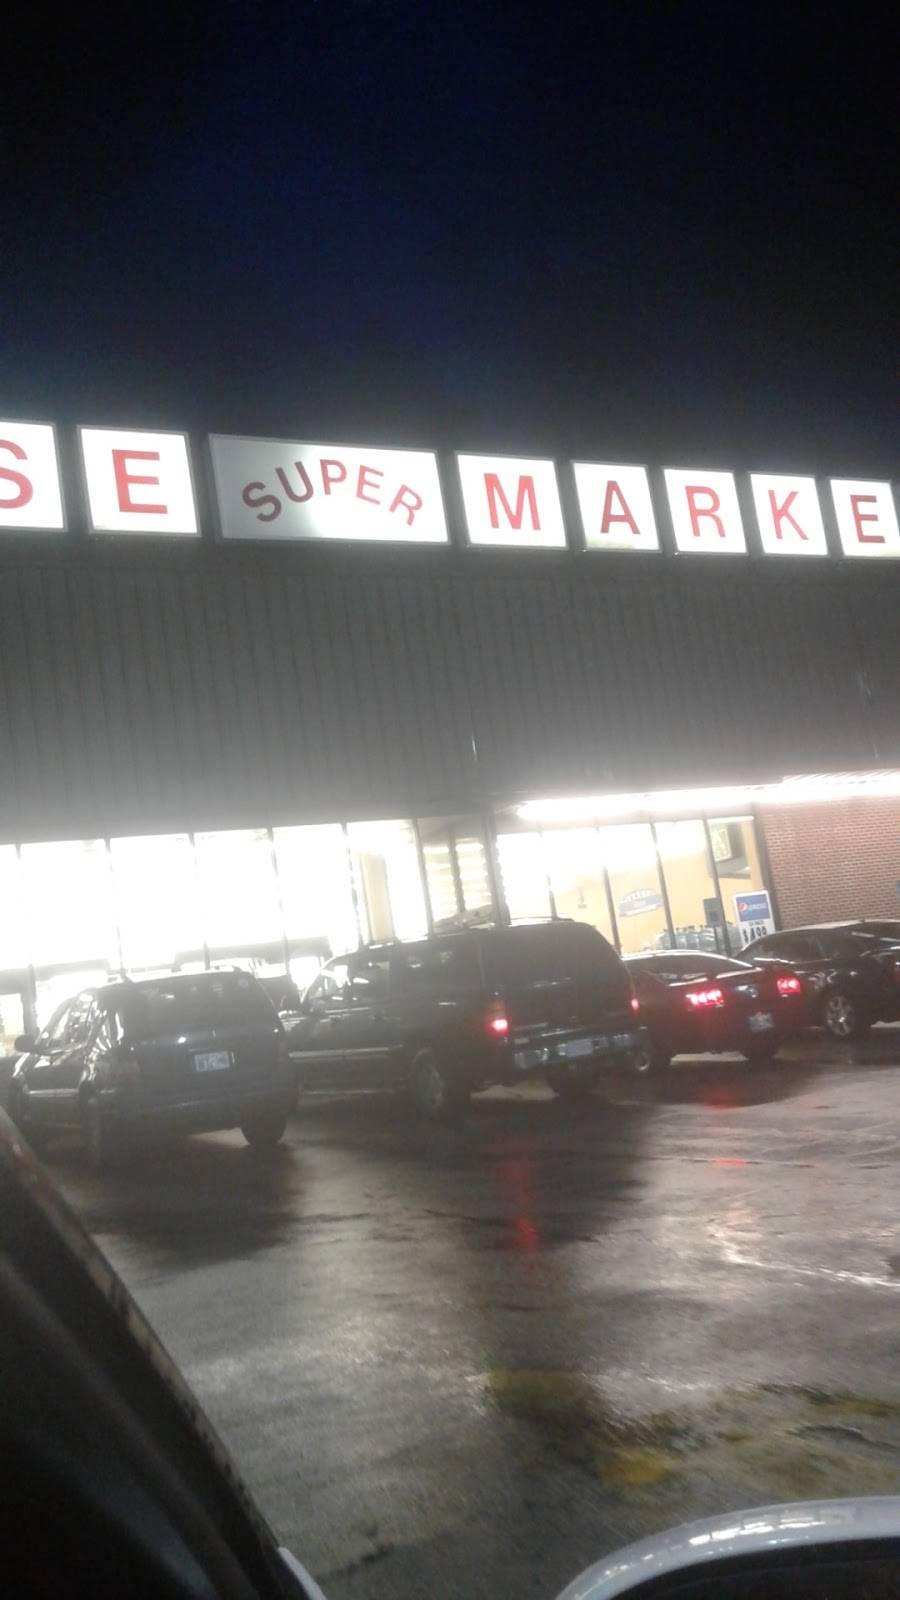 Warehouse Market - supermarket  | Photo 4 of 9 | Address: 1245 S Garnett Rd, Tulsa, OK 74128, USA | Phone: (918) 437-3166